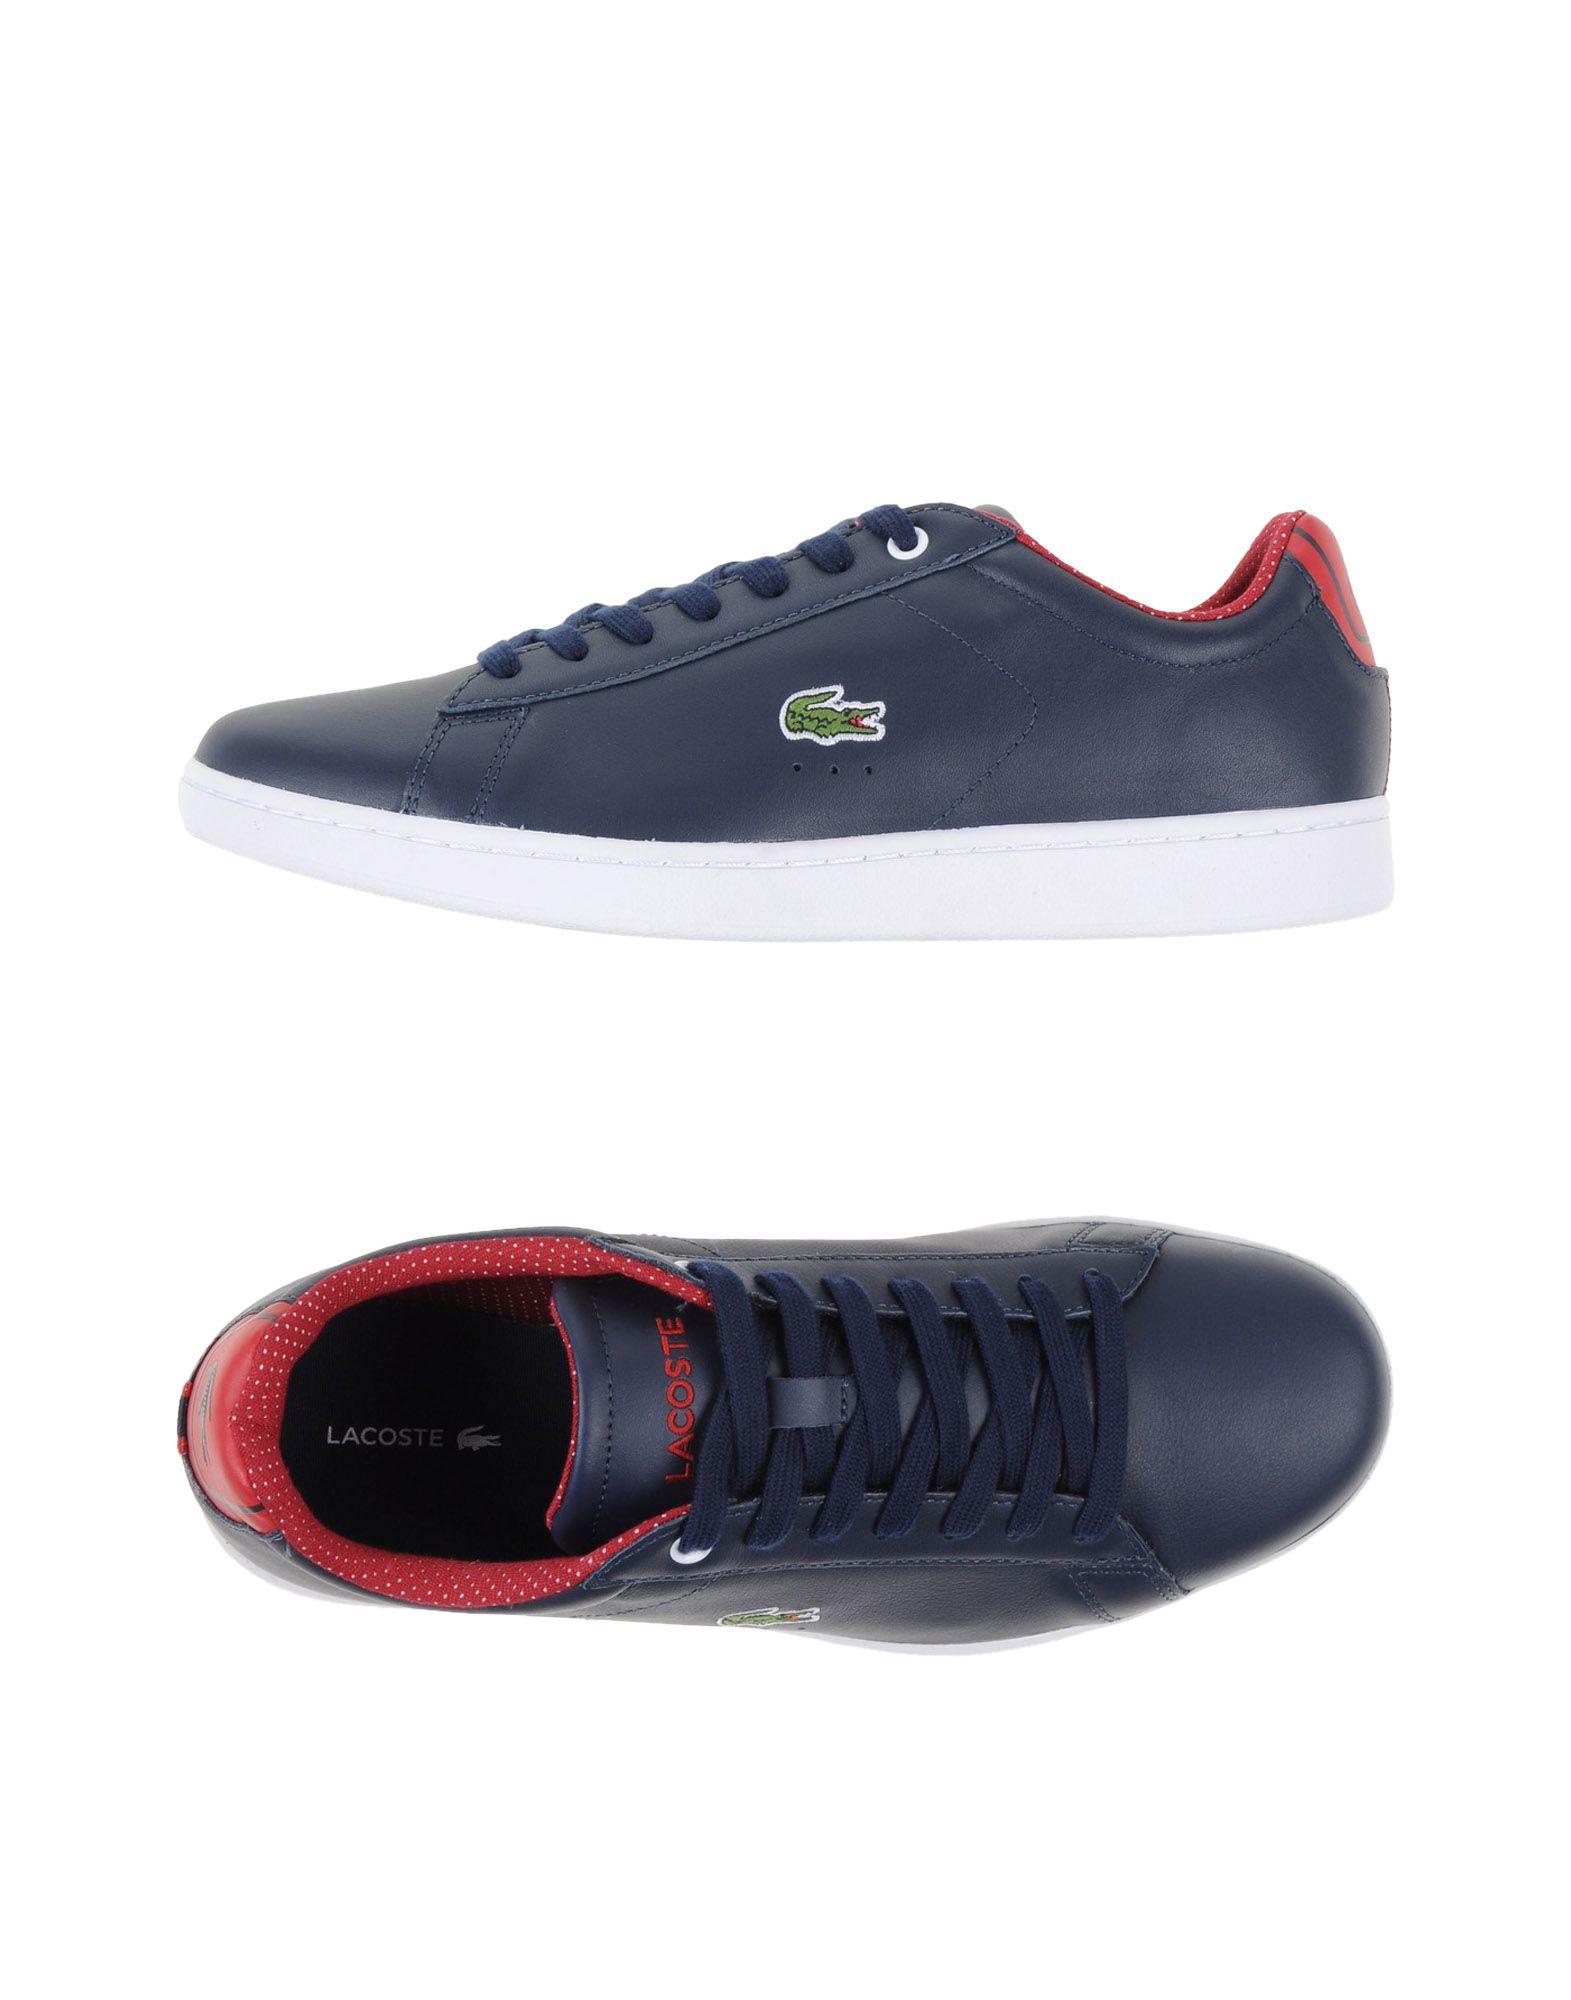 Sneakers Lacoste Carnaby Evo - 116 1 - Donna - Evo 11008113XJ 85c6bd